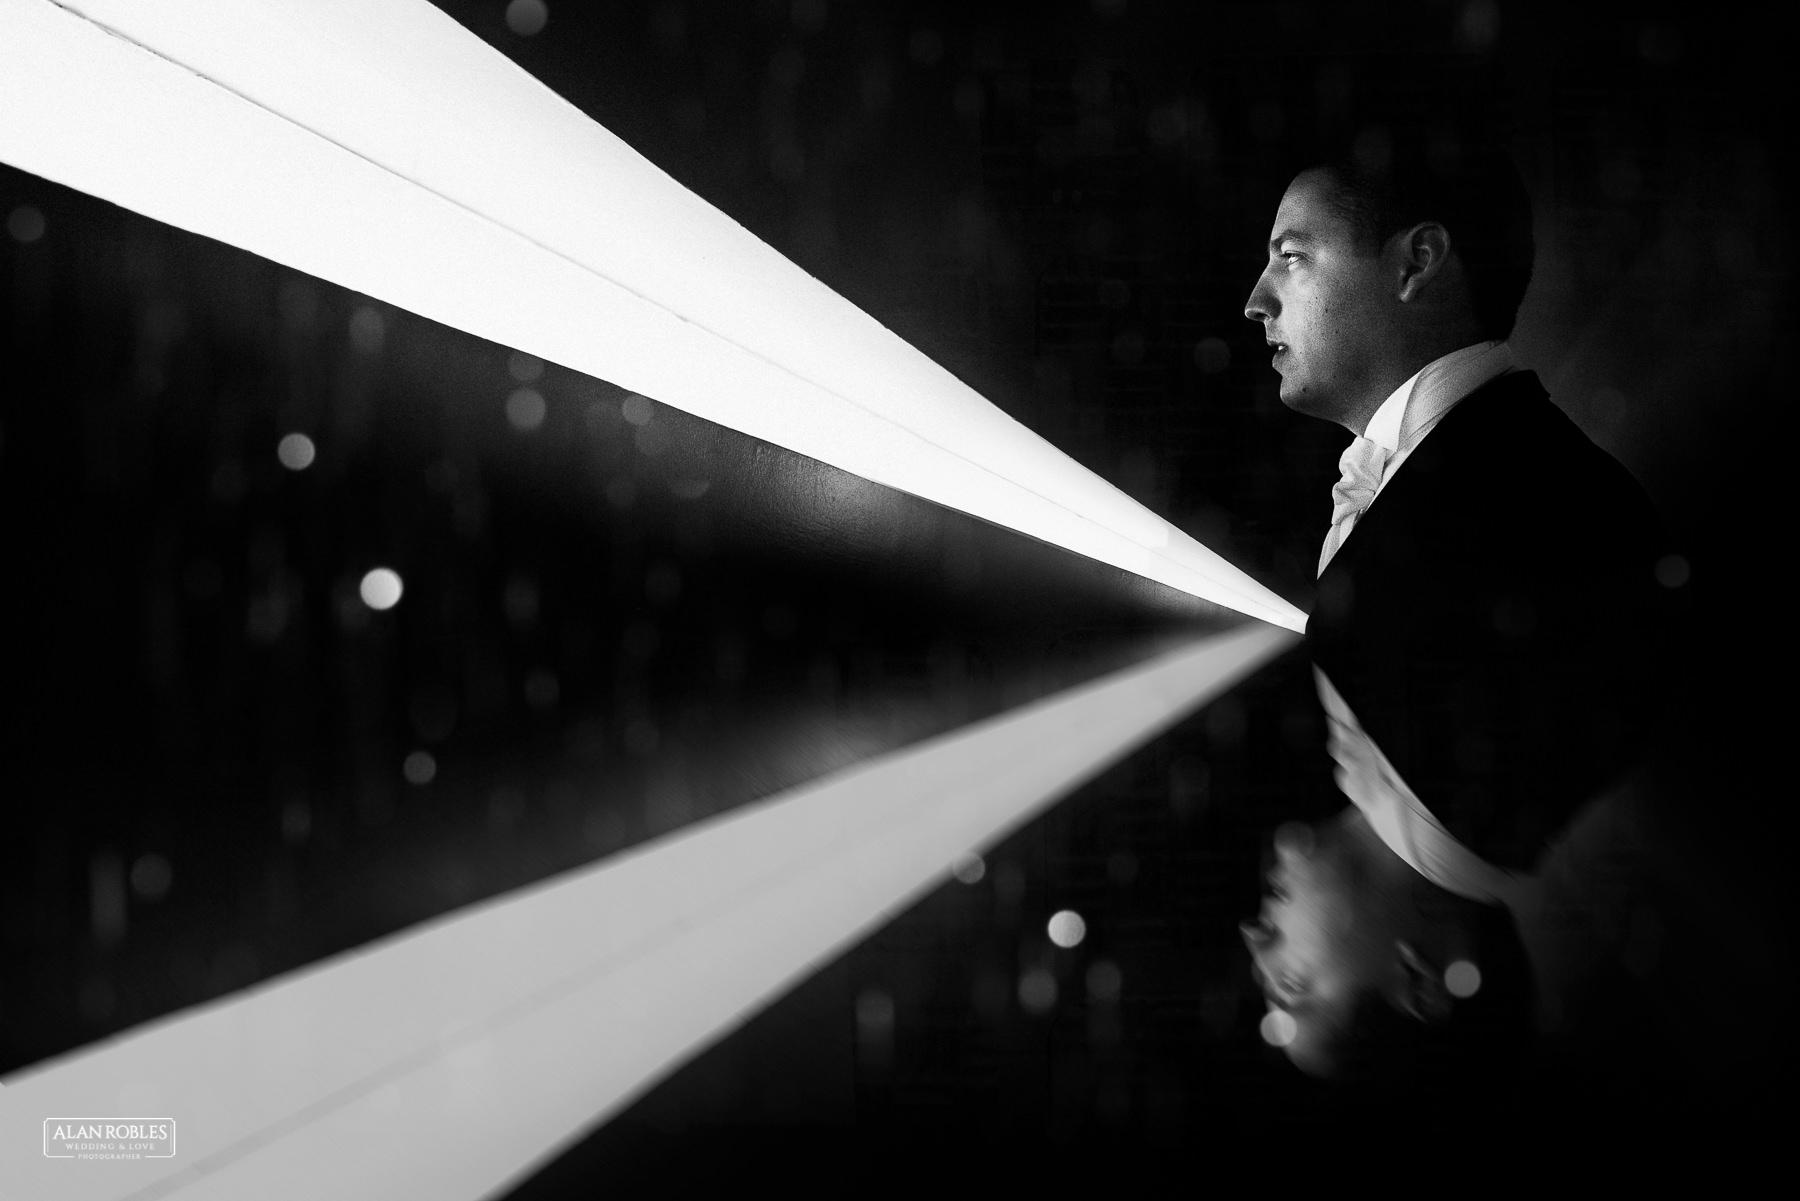 Alan Robles fotografo de bodas guadalajara - LyP Hotel Demetria-35